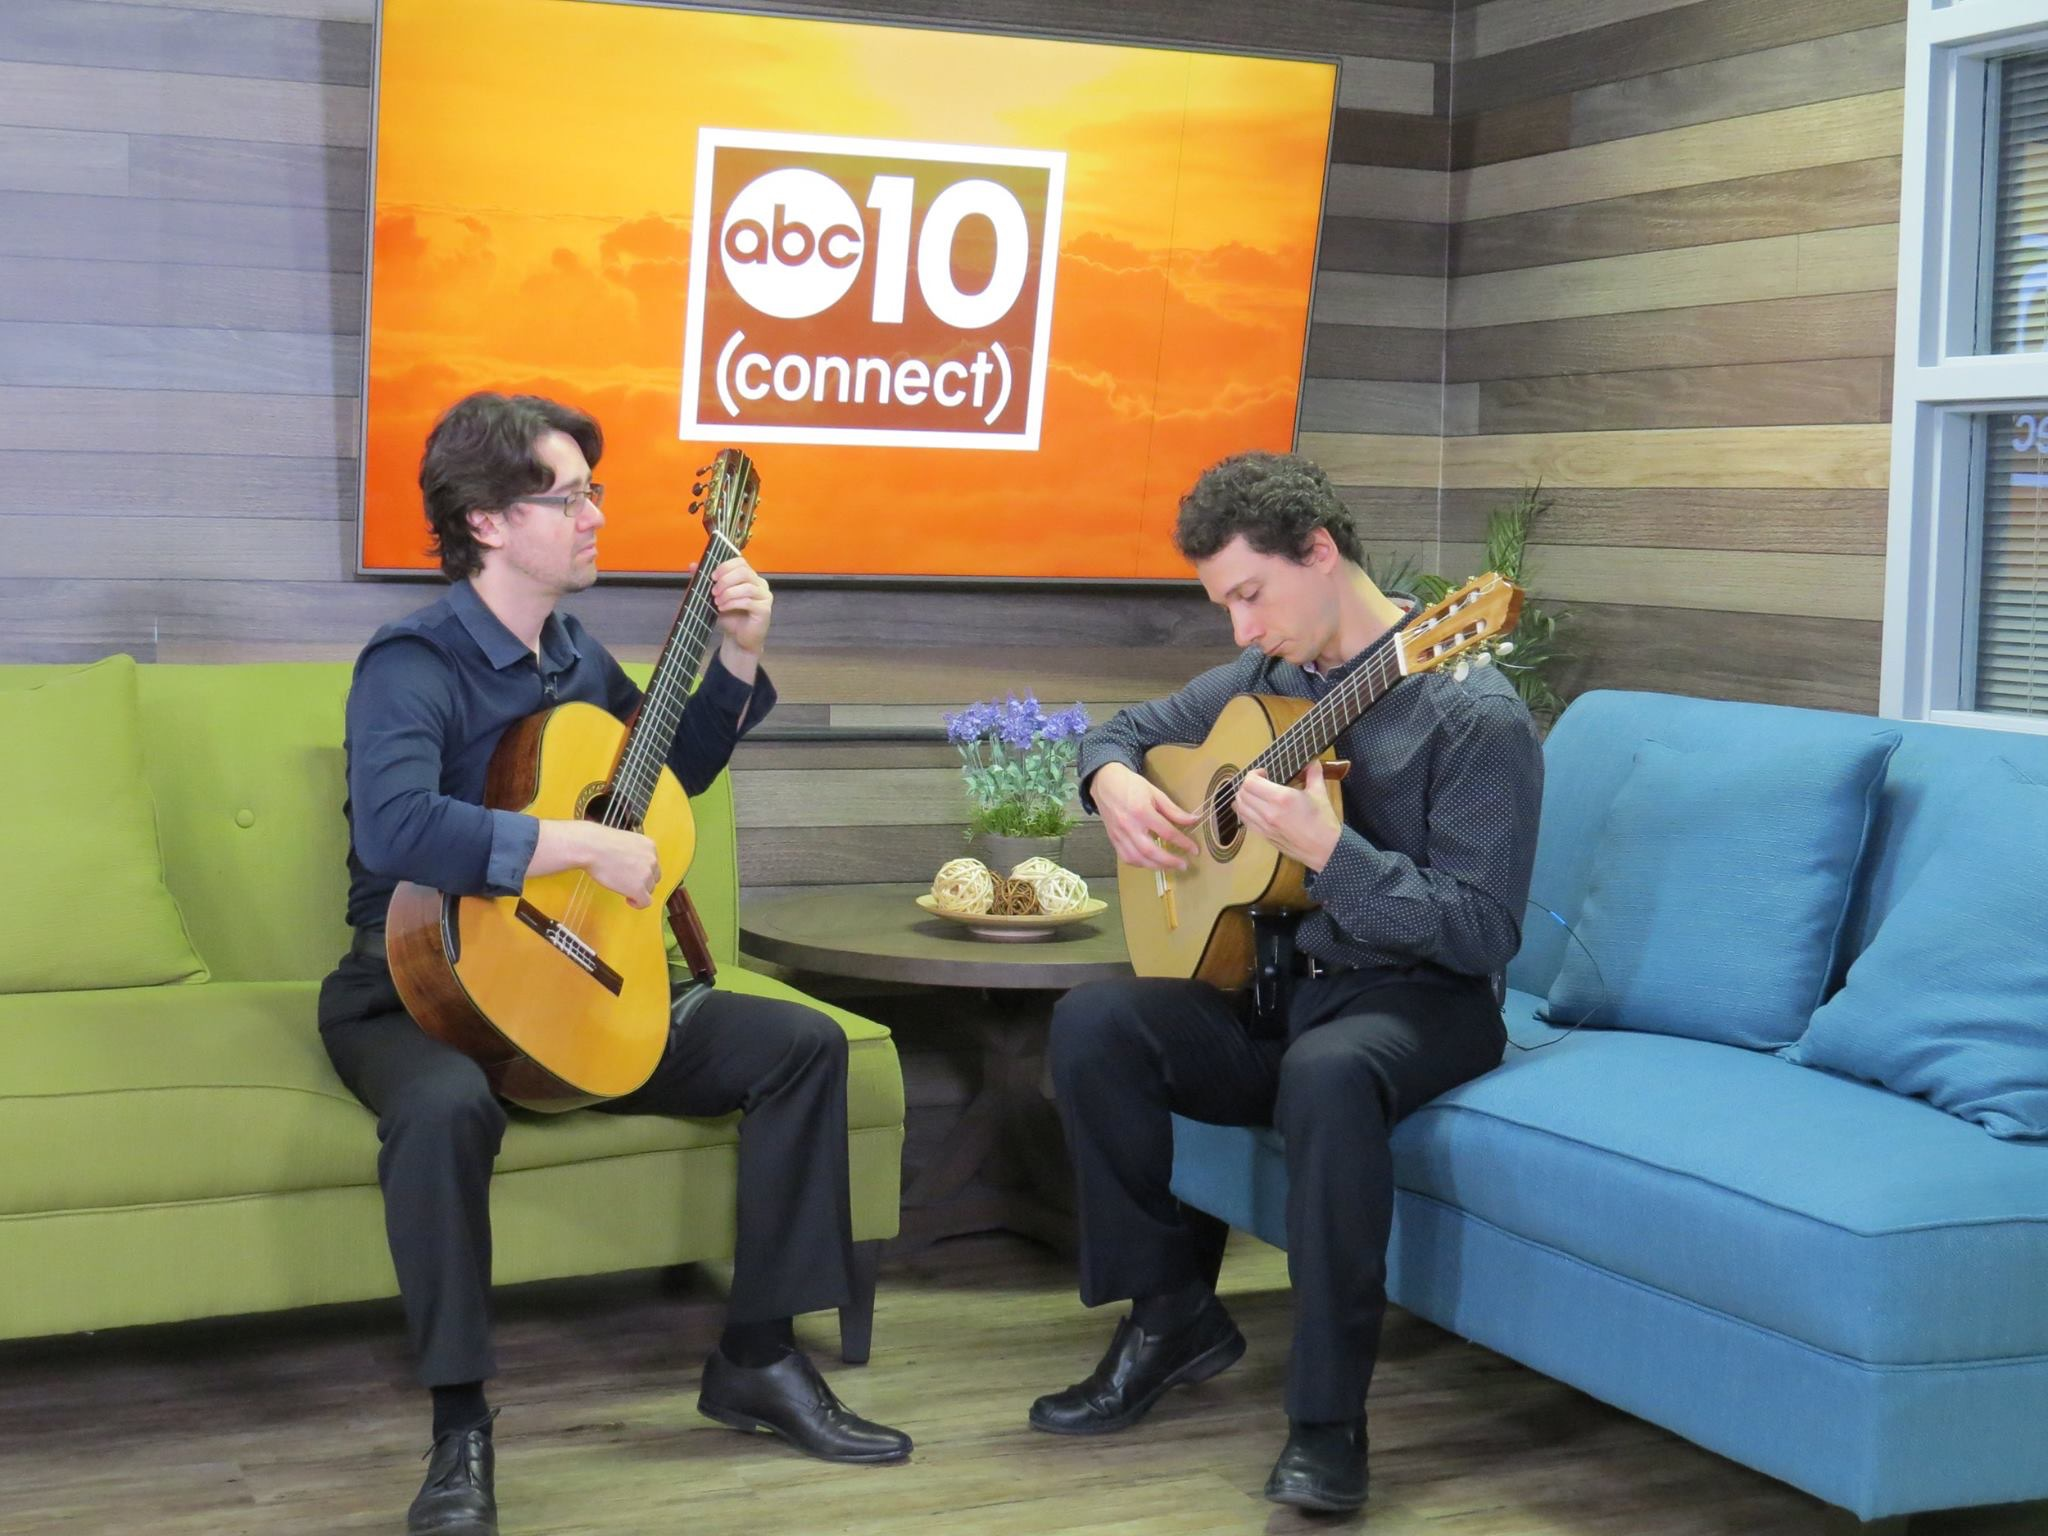 With Grisha Goryachev on ABC network